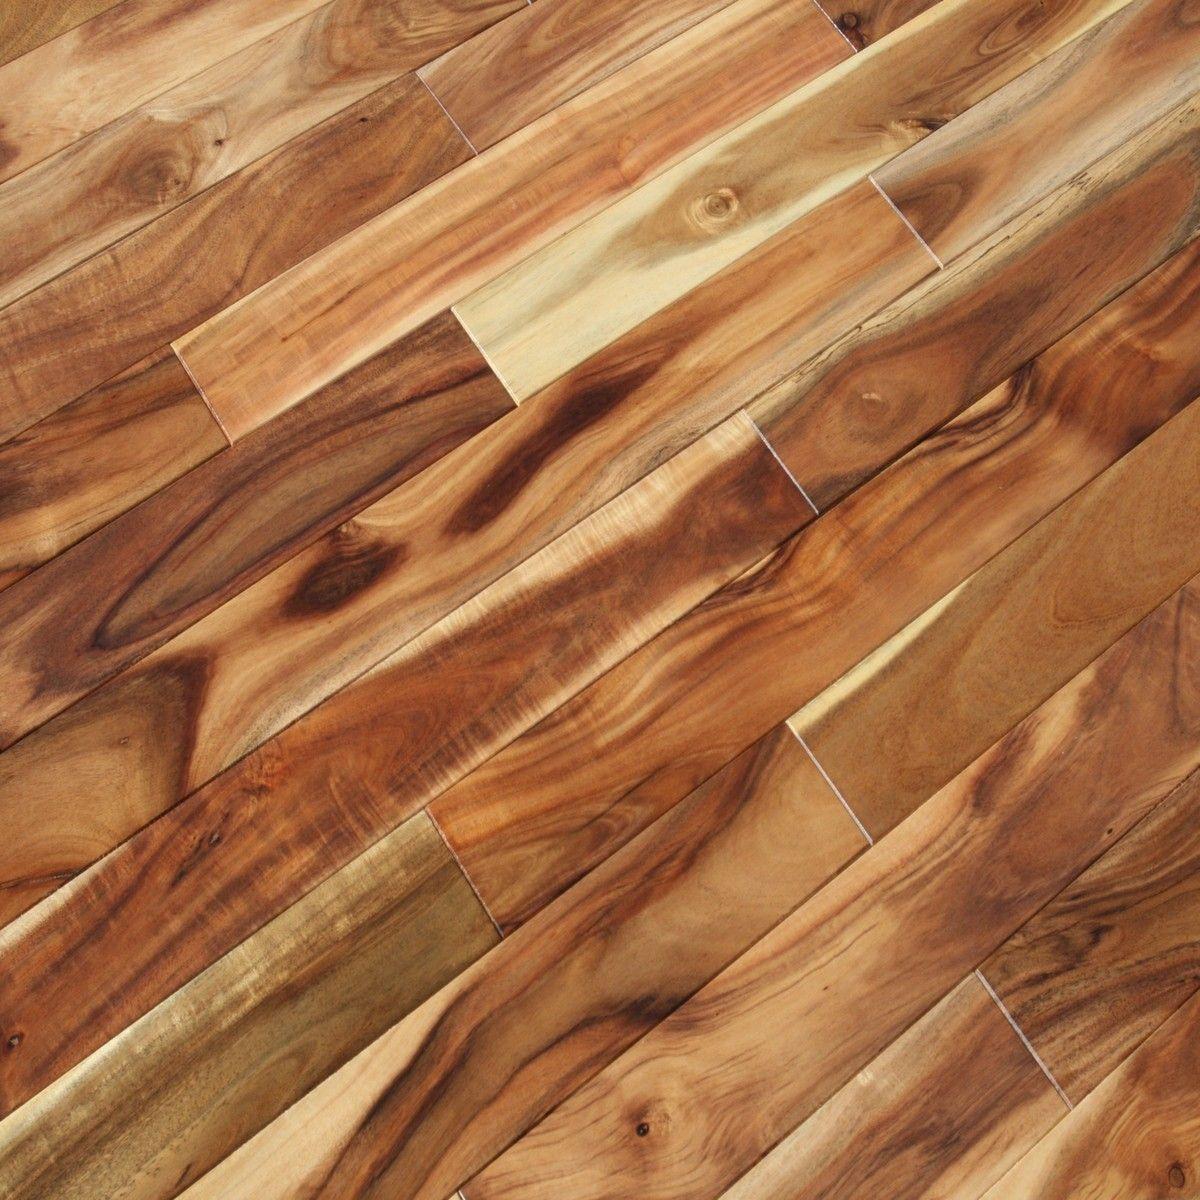 are hand scraped hardwood floors a fad of acacia asian walnut blonde hardwood flooring prefinished solid regarding acacia asian walnut blonde hardwood flooring prefinished solid hardwood floors elegance plyquet